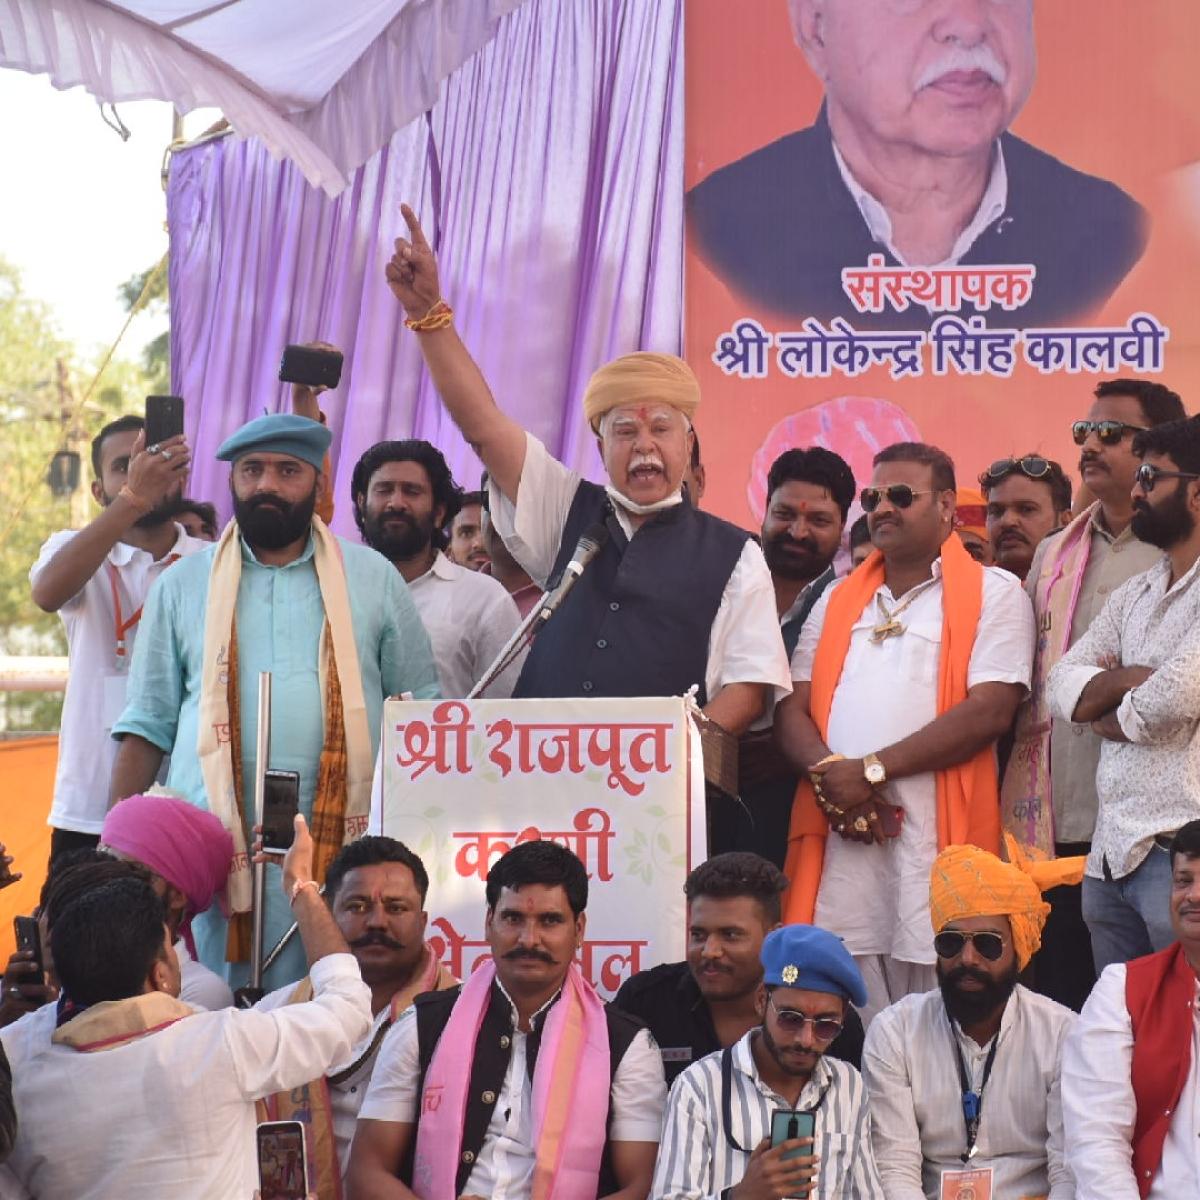 Ujjain: Rajput Karni Sena's holds huge rally in Mahakal city